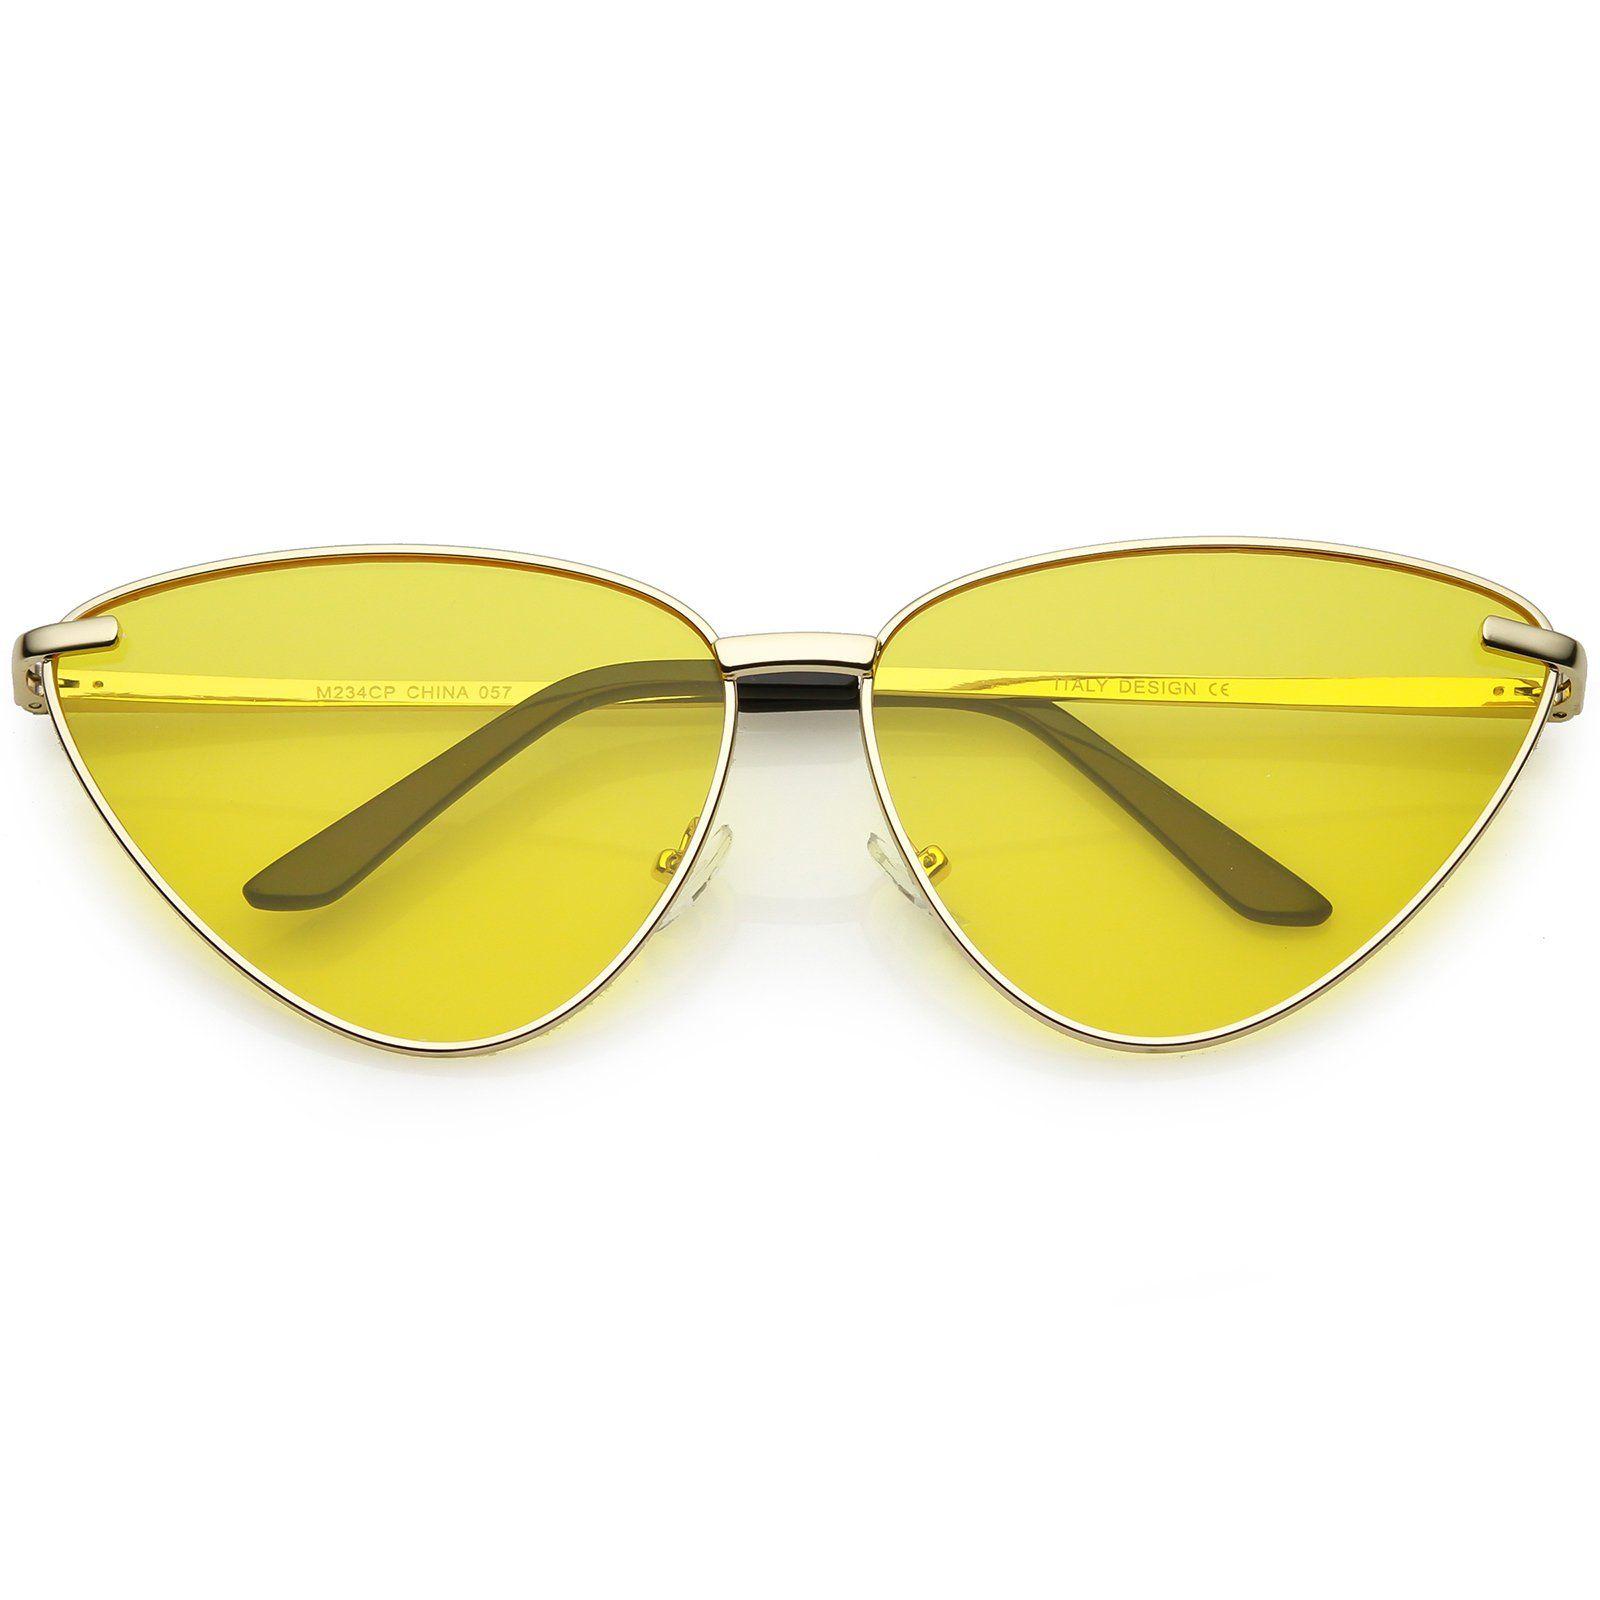 4b1db3a0548 Oversize Cat Eye Sunglasses Thin Metal Frame Color Tinted Flat Lens 64mm   sunglasses  frame  sunglass  cateye  oversized  clear  sunglassla  bold   mirrored ...